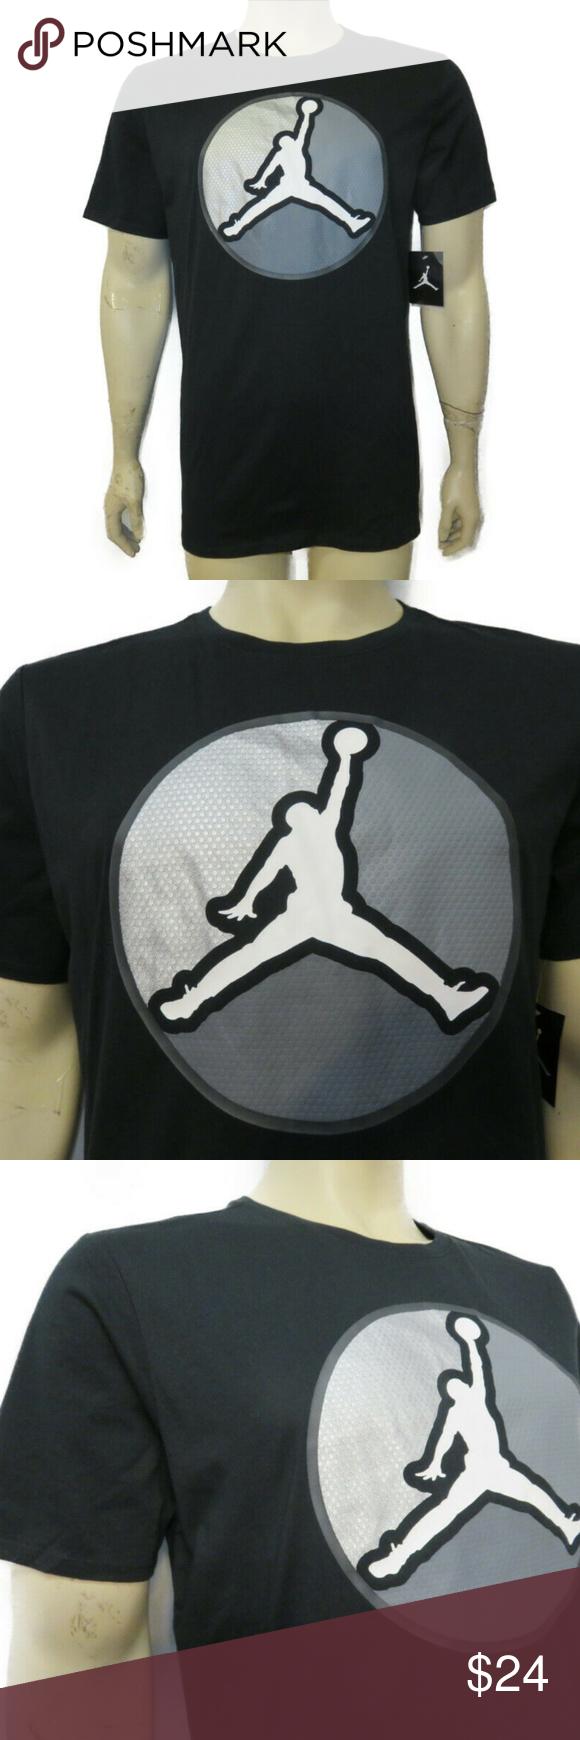 98d50a9e79ae Air Jordan Retro VIII Men 706847-011 Air Jordan Men s Jordan 8 Always  Reppin T